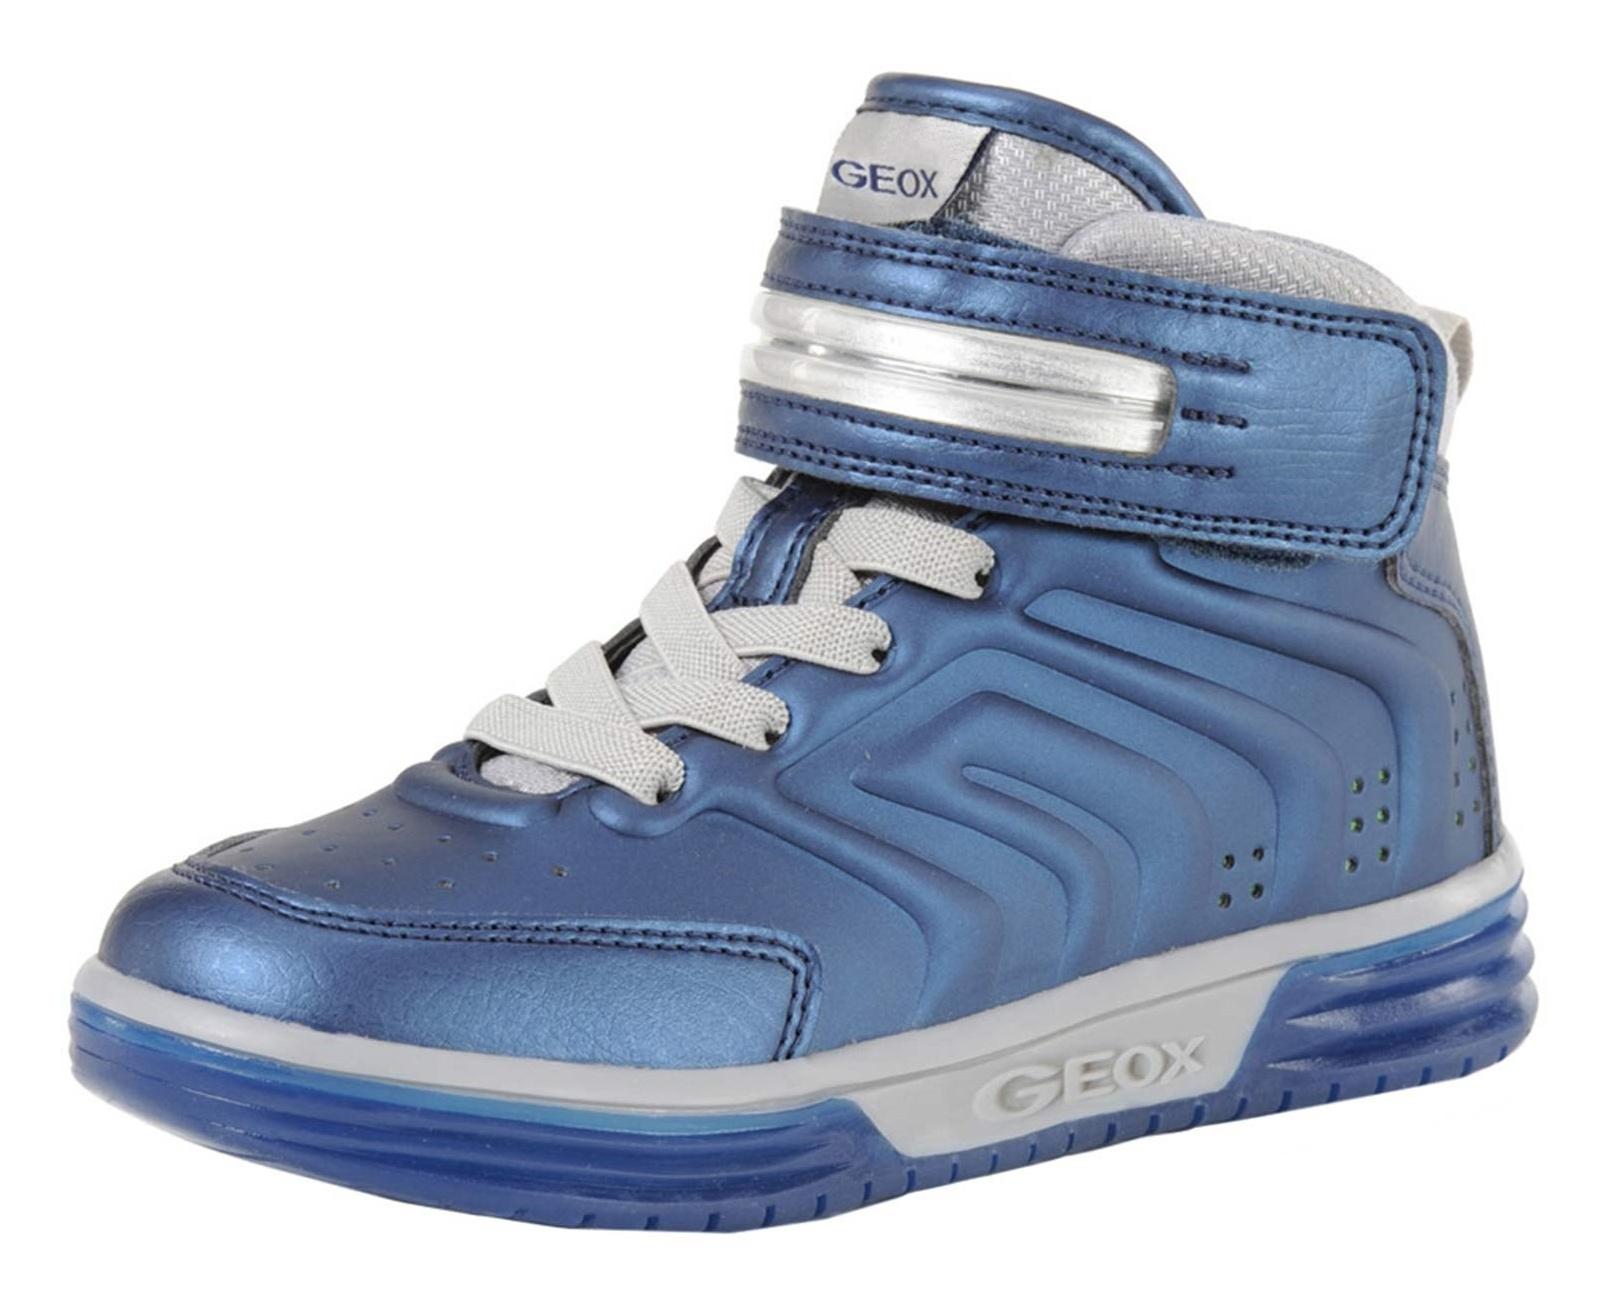 کفش ورزشی پسرانه Argonat - جی اوکس - آبي - 2